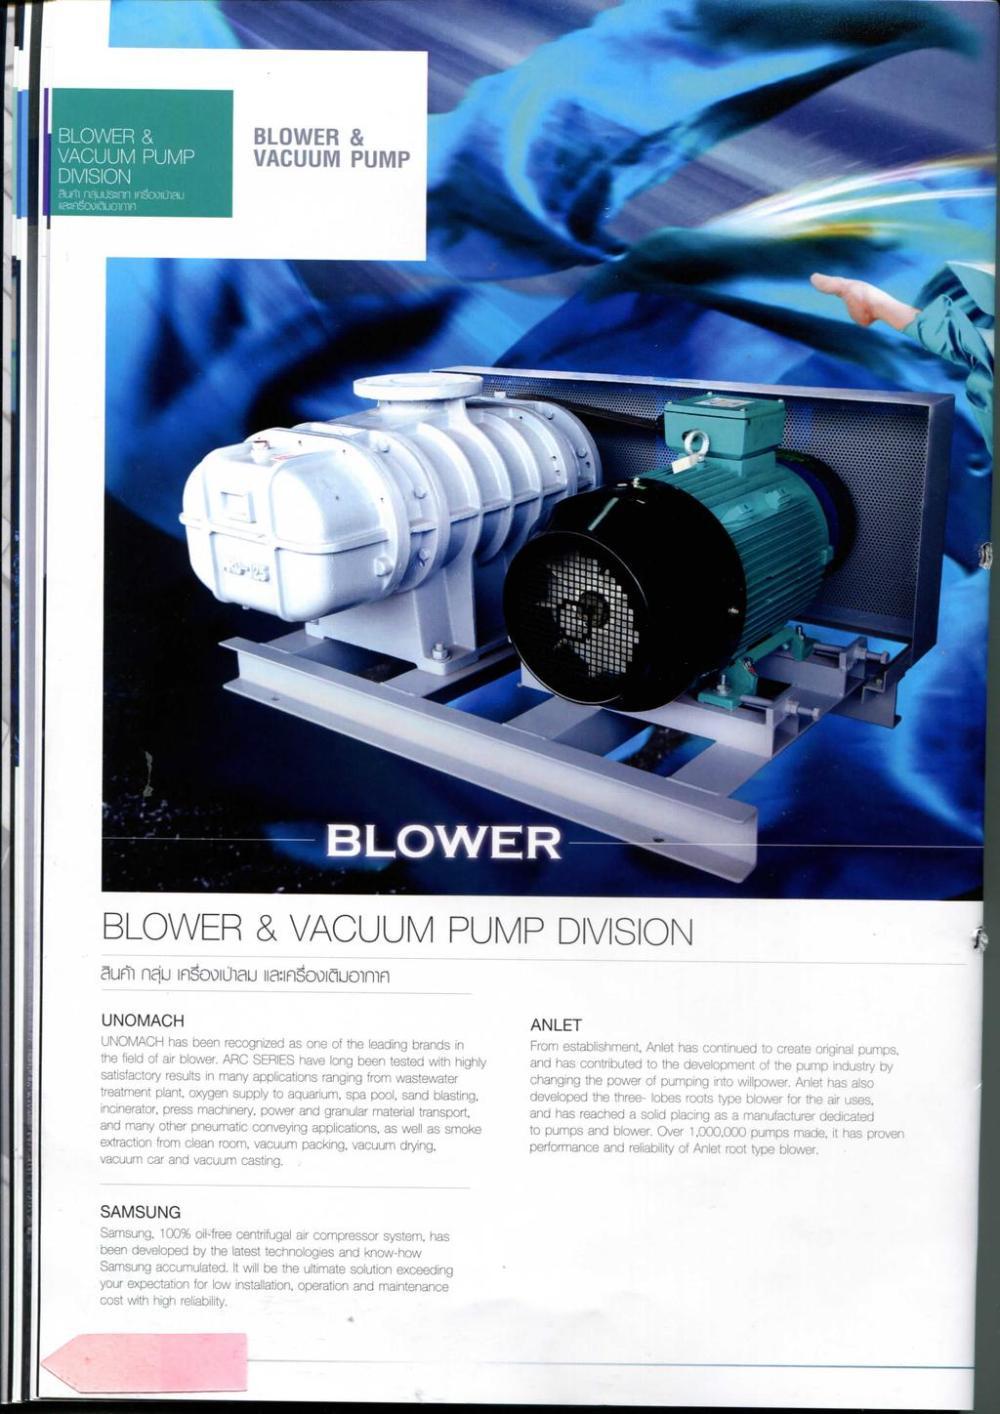 medium resolution of blower vacuum pump division auni nauusinn insooiijiau iiansooiauoimn blower blower vacuum pump division aum